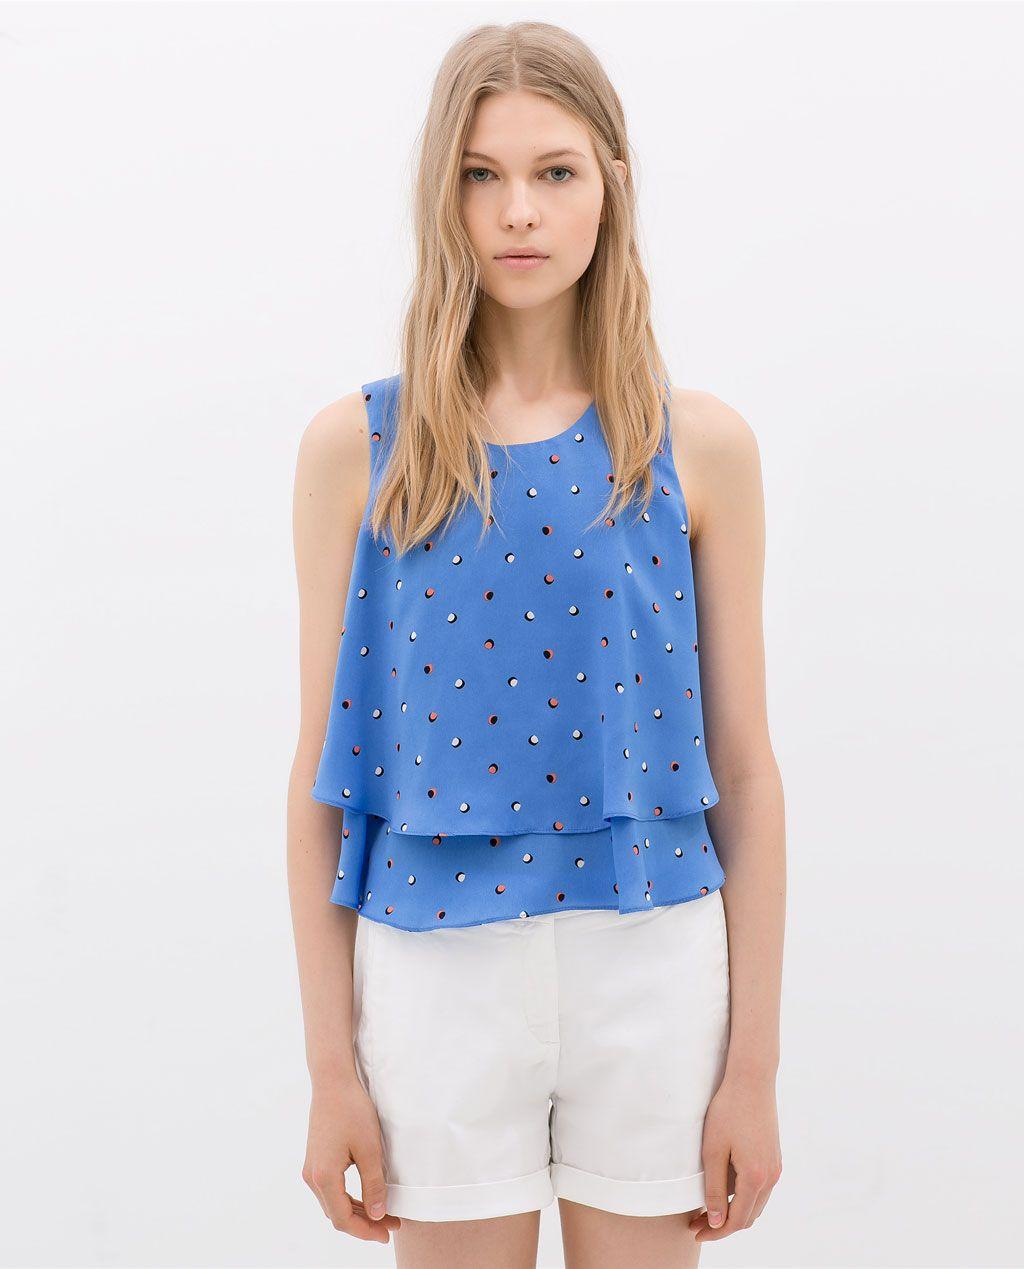 Zara Women/'s T-shirt lookbook Spring//Summer Fashion  sleeveless Striped Red